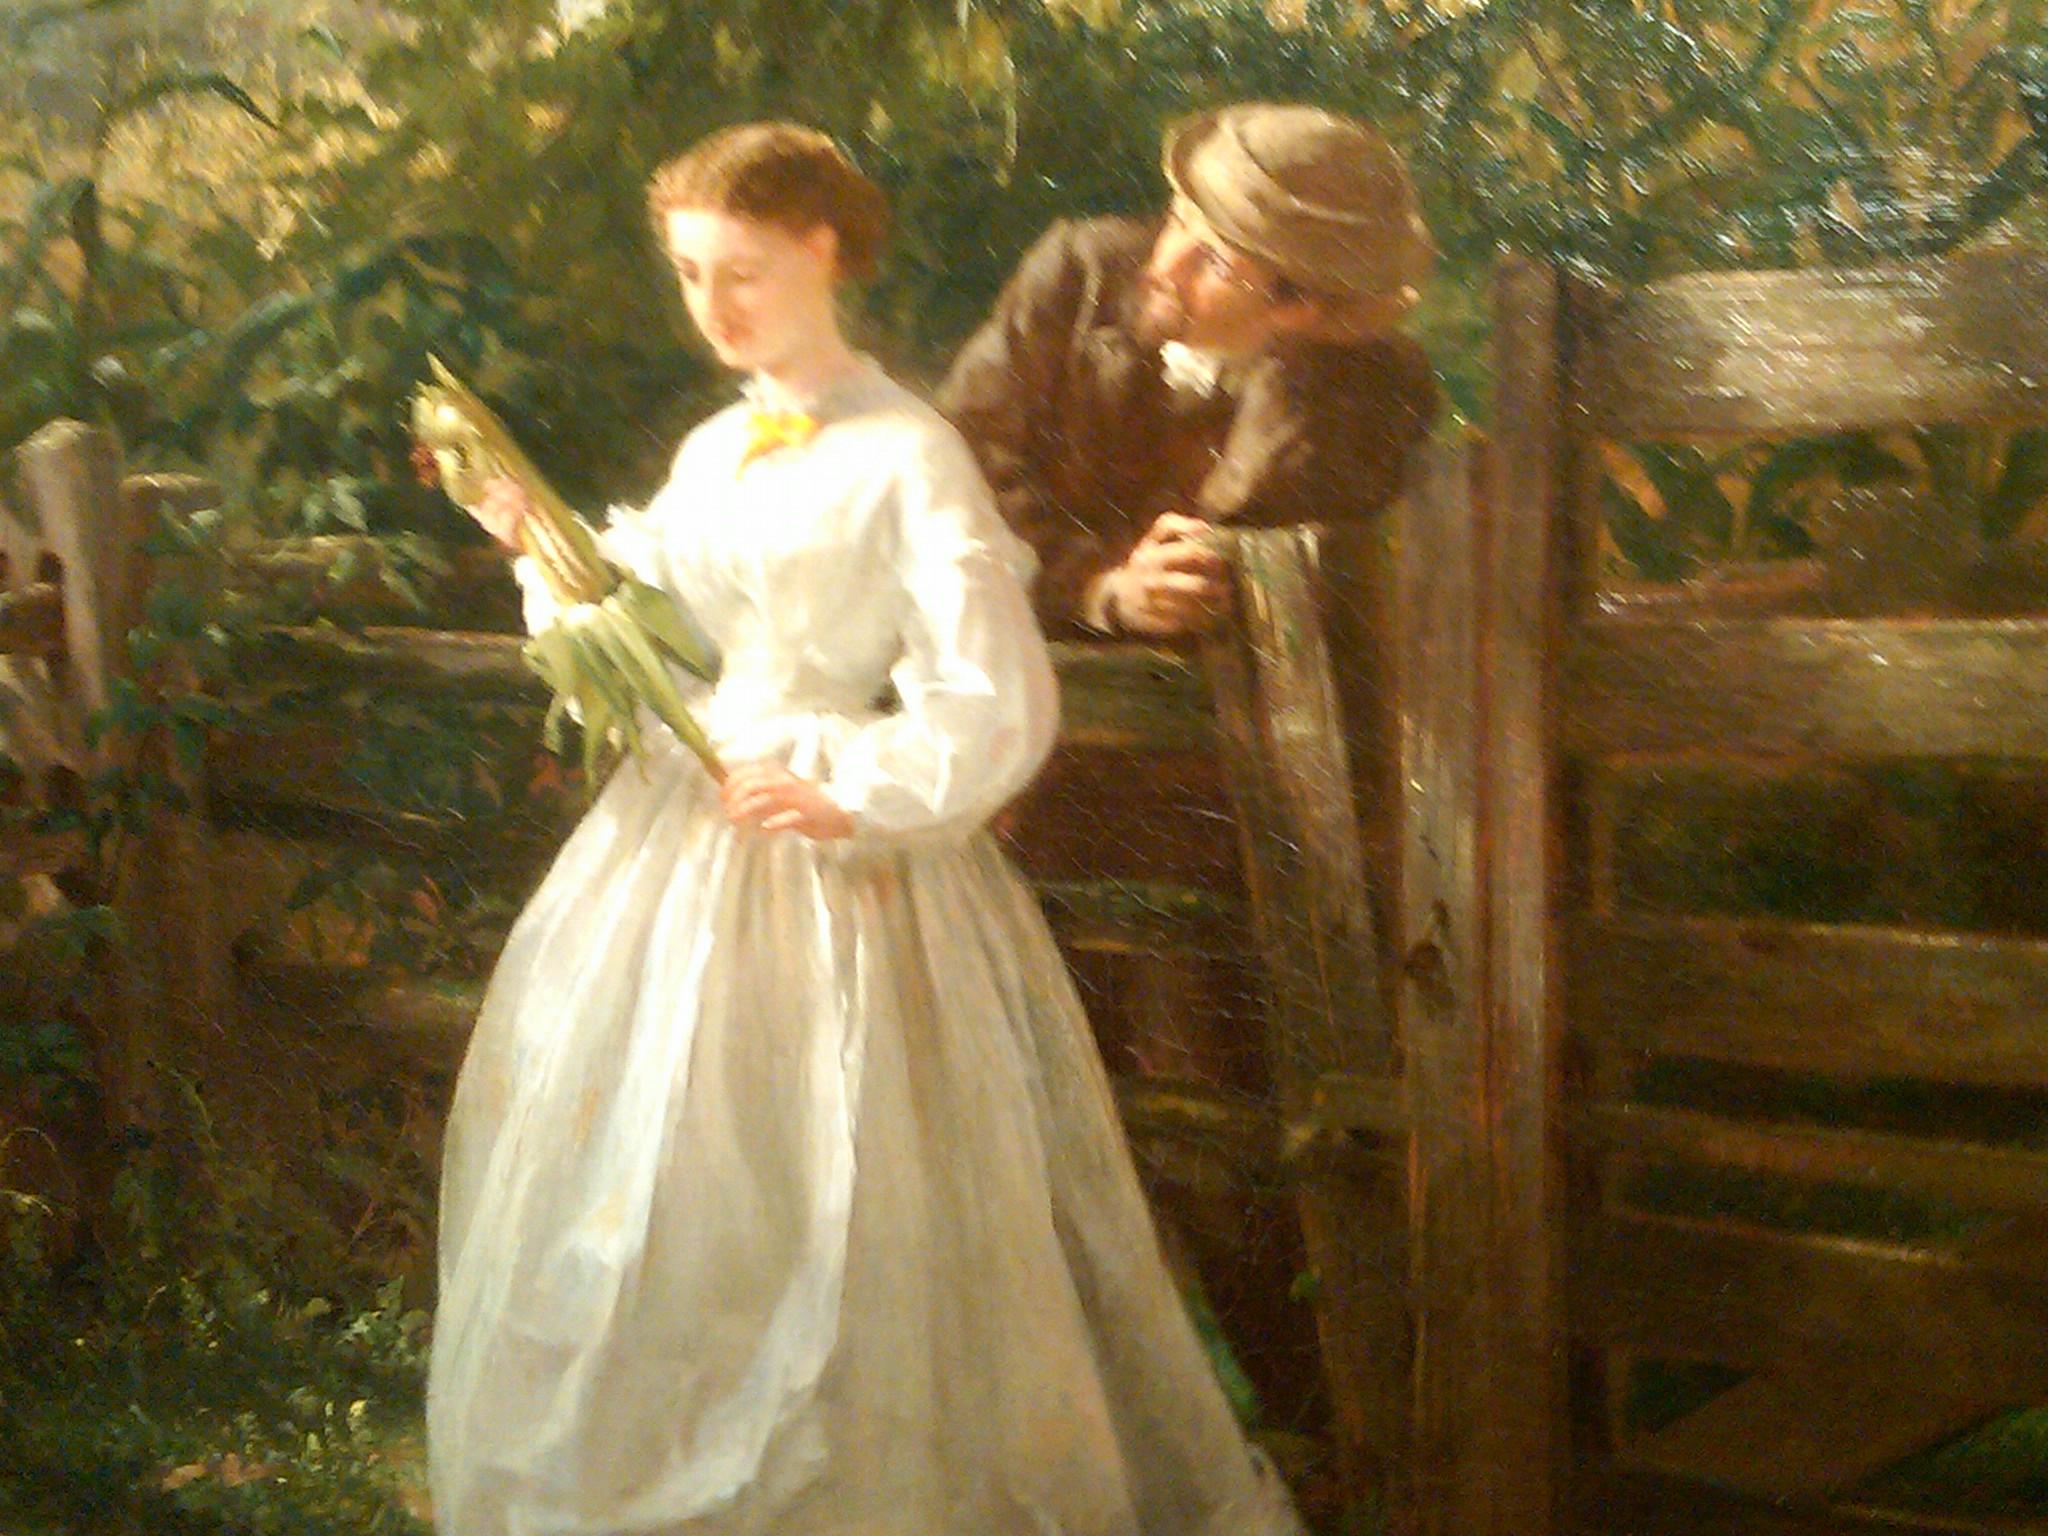 a visit into the romantic era